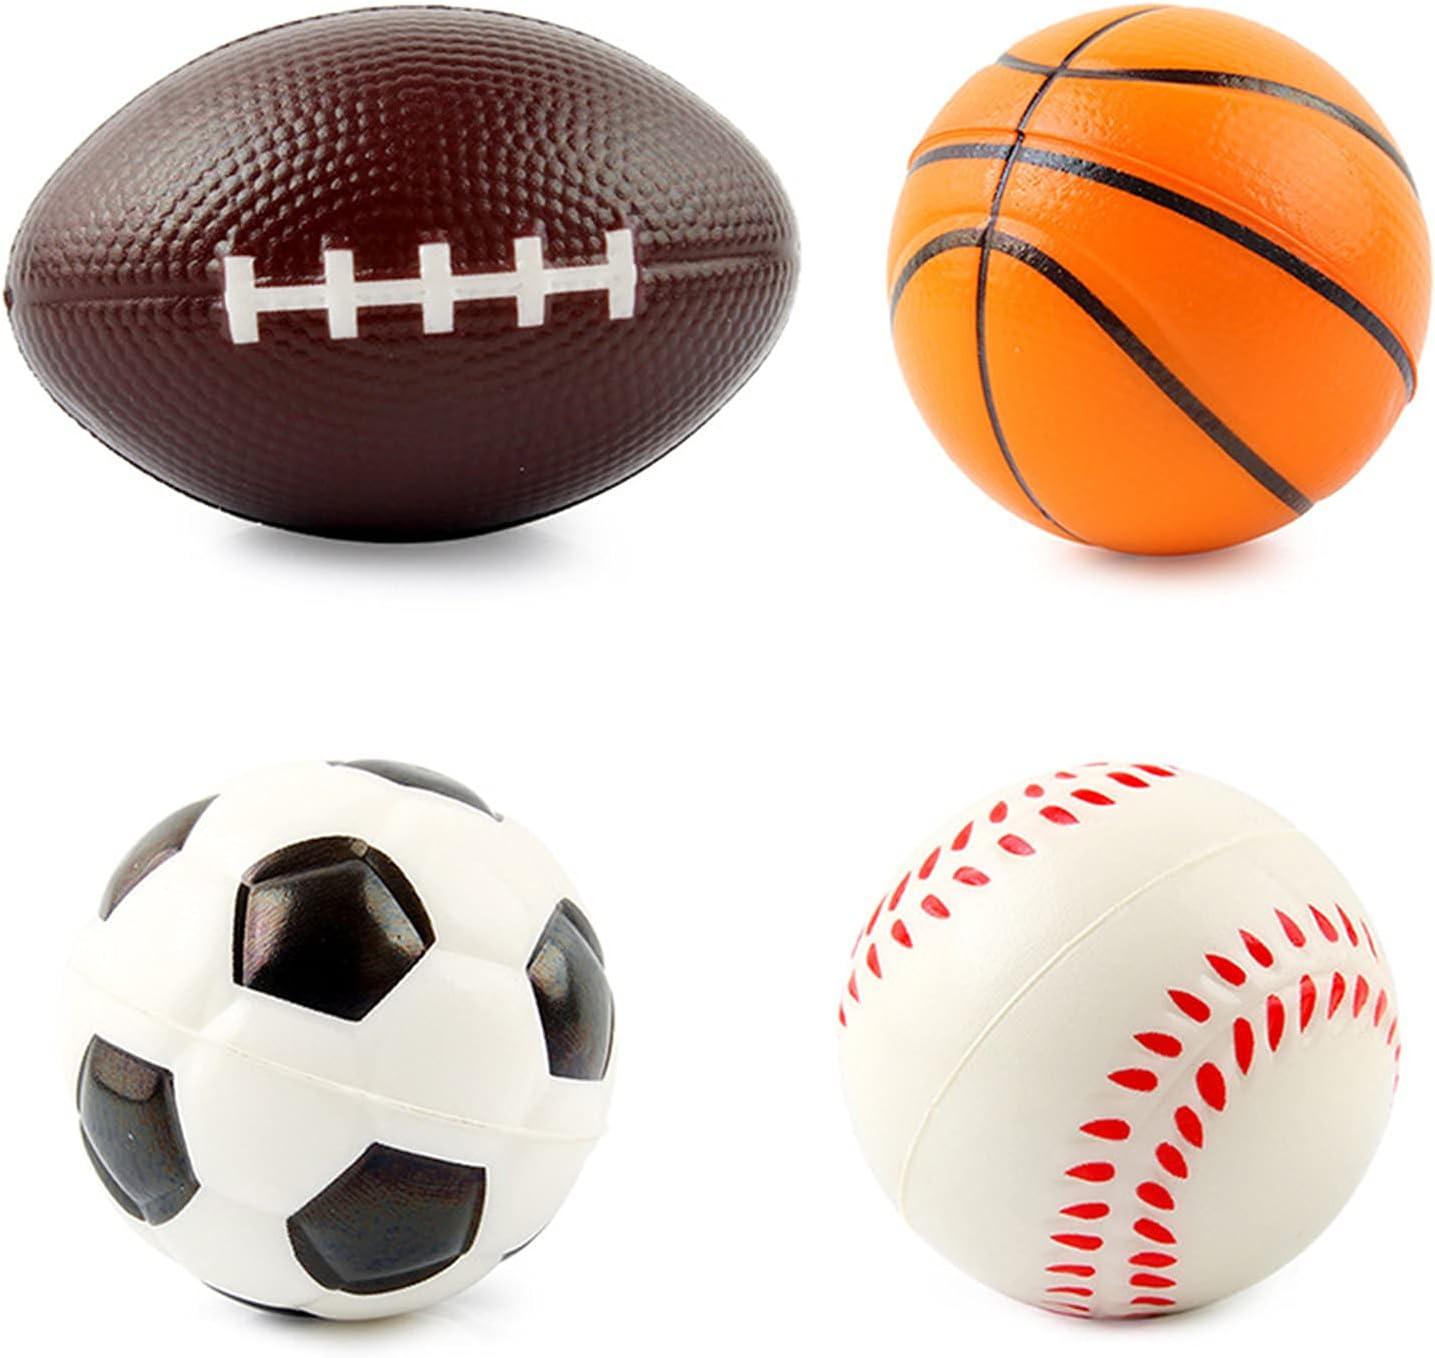 Onefa Houston Mall Plush Figure Toys Grip Basketball Football Footb Max 85% OFF Strength